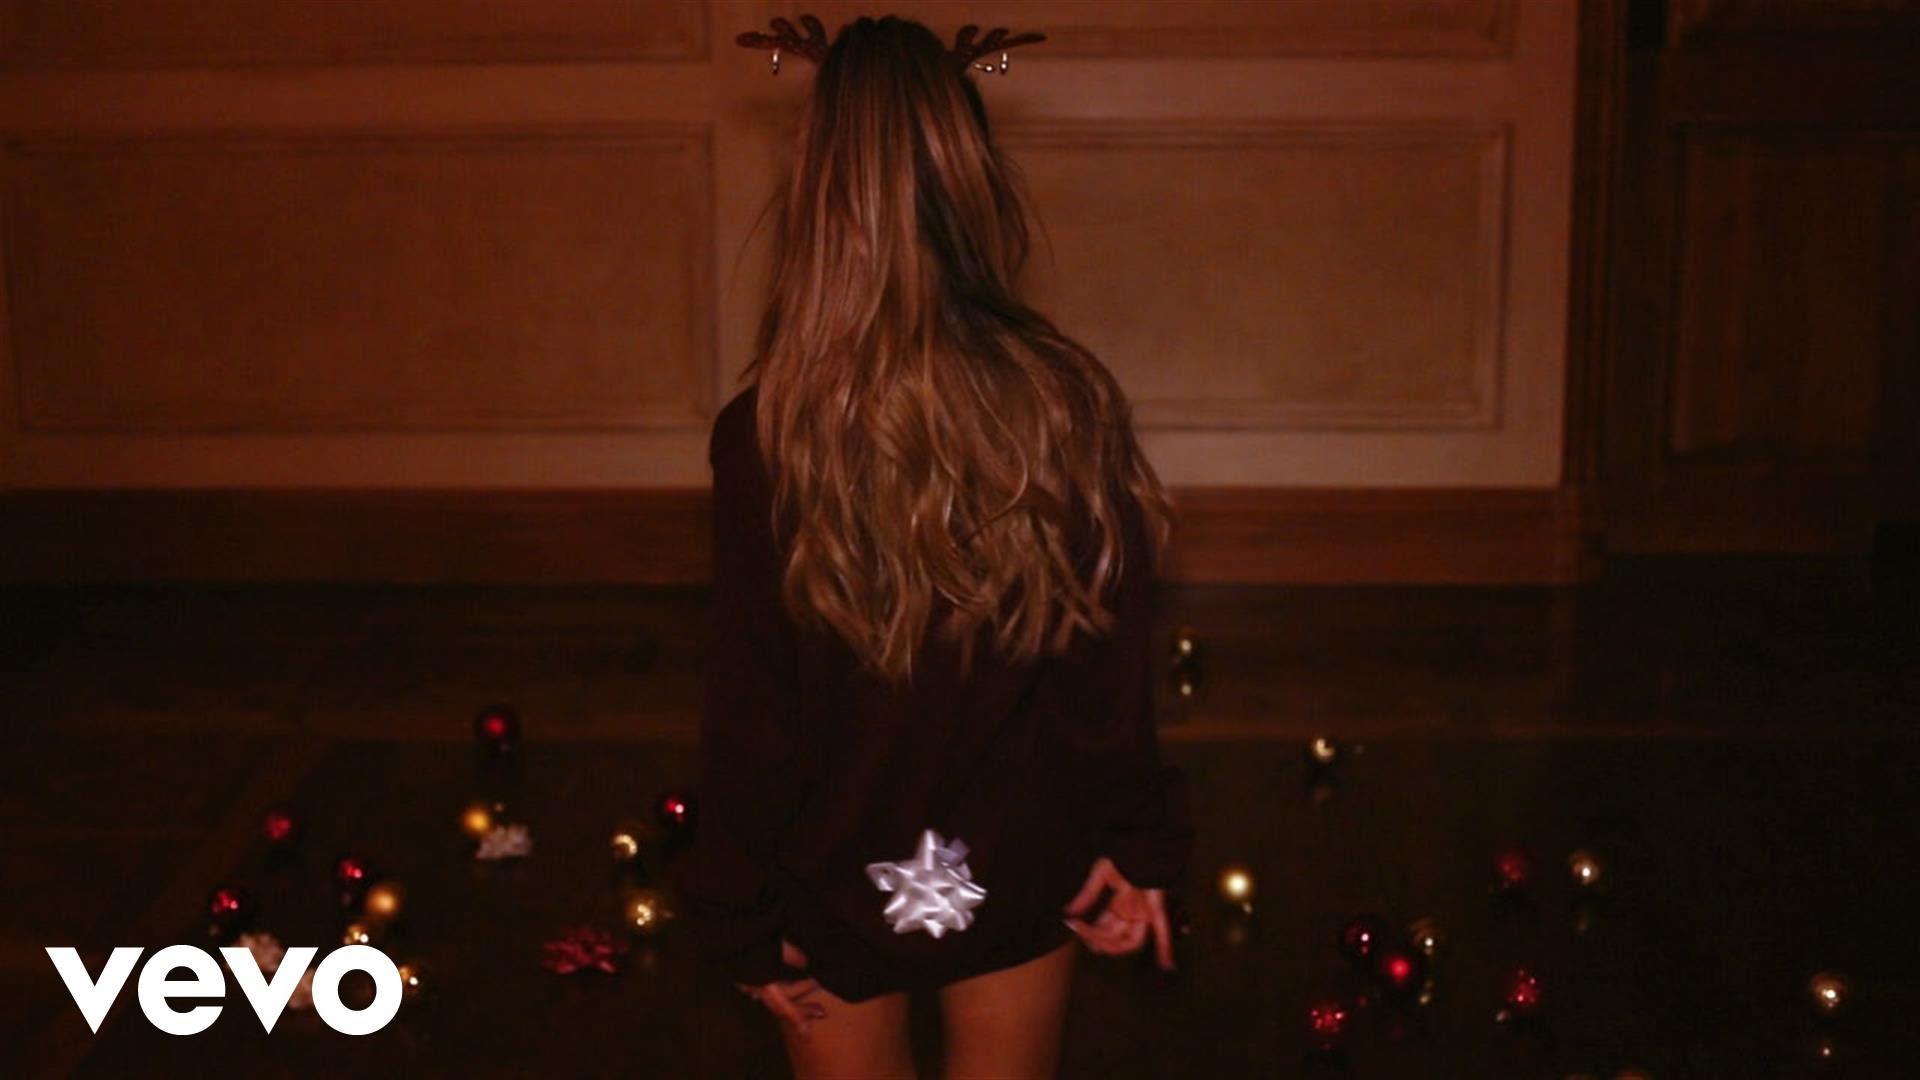 Ariana Grande — Santa Tell Me